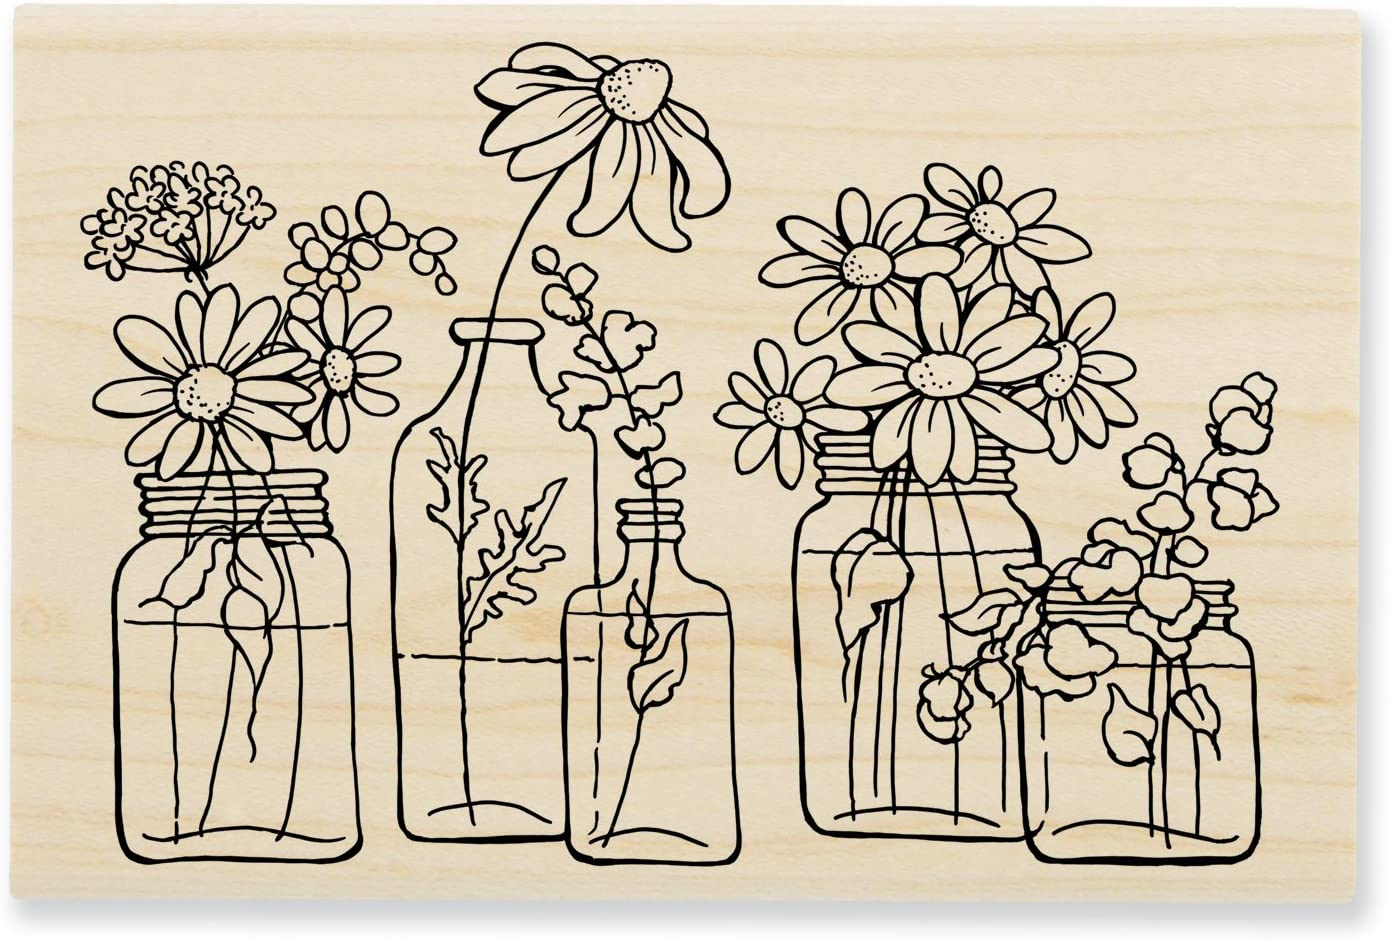 3.5 x 4 Inkadinkado Floral Mason Jar Mounted Rubber Stamp for Card Making and Scrapbooking